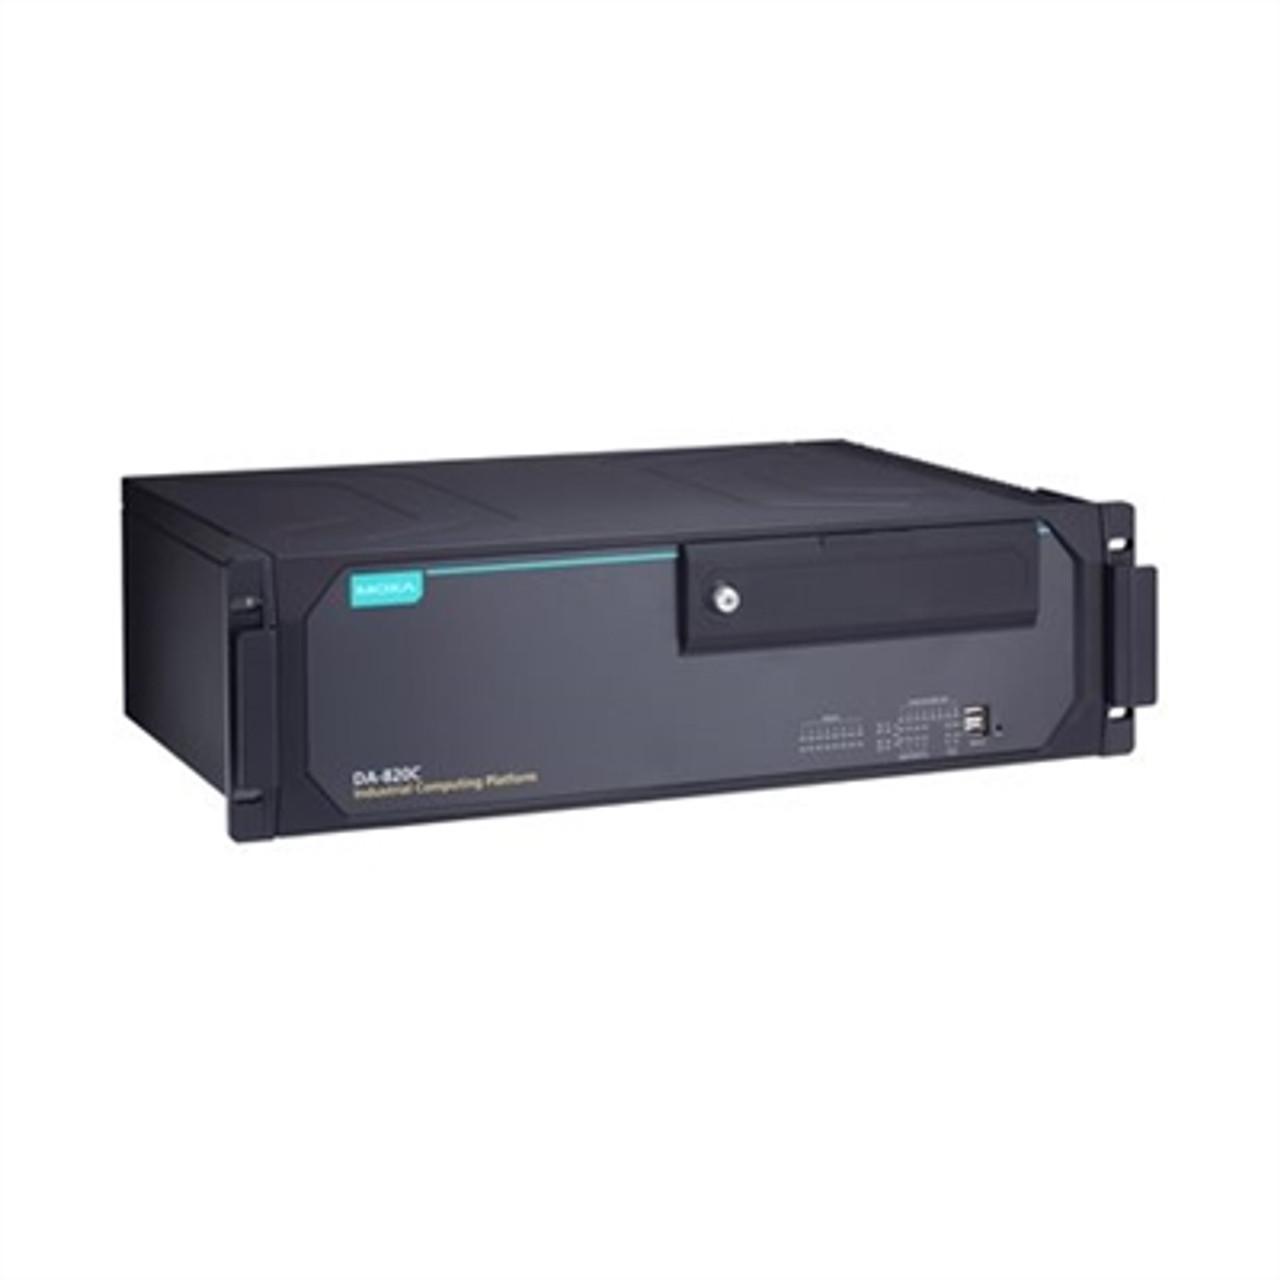 Moxa DA-820C-KL7-HH x86 computer